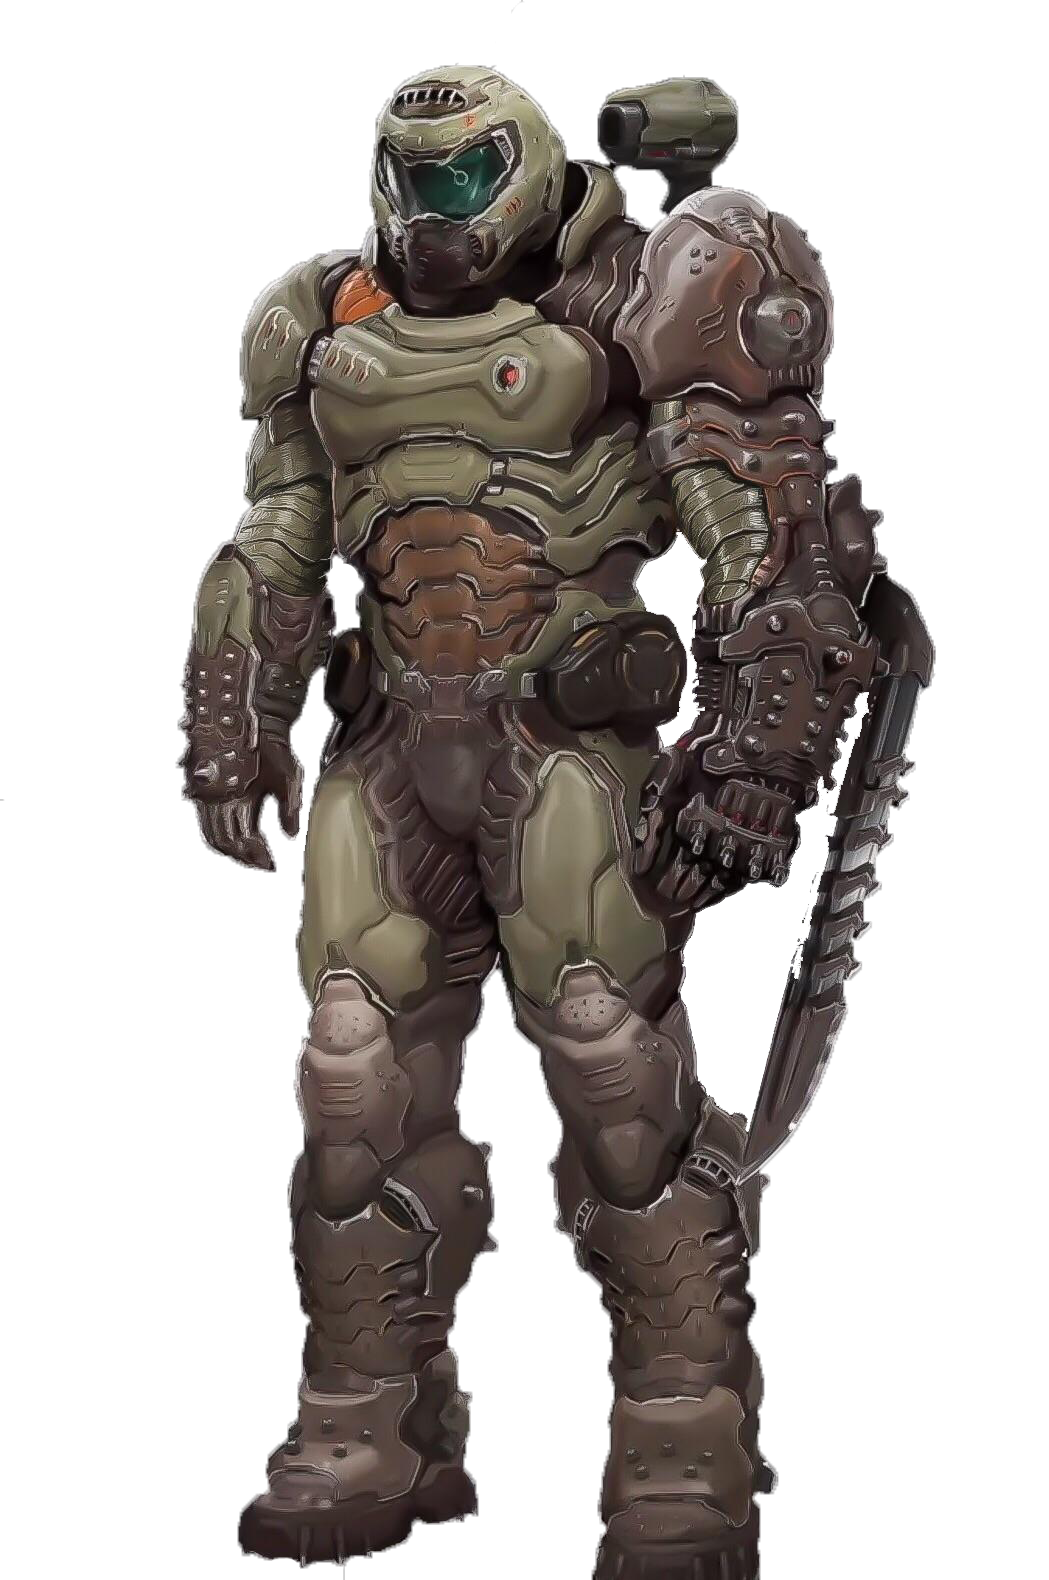 Ultimate Destiny 01 The Doom Slayer By Enriksd8 On Deviantart